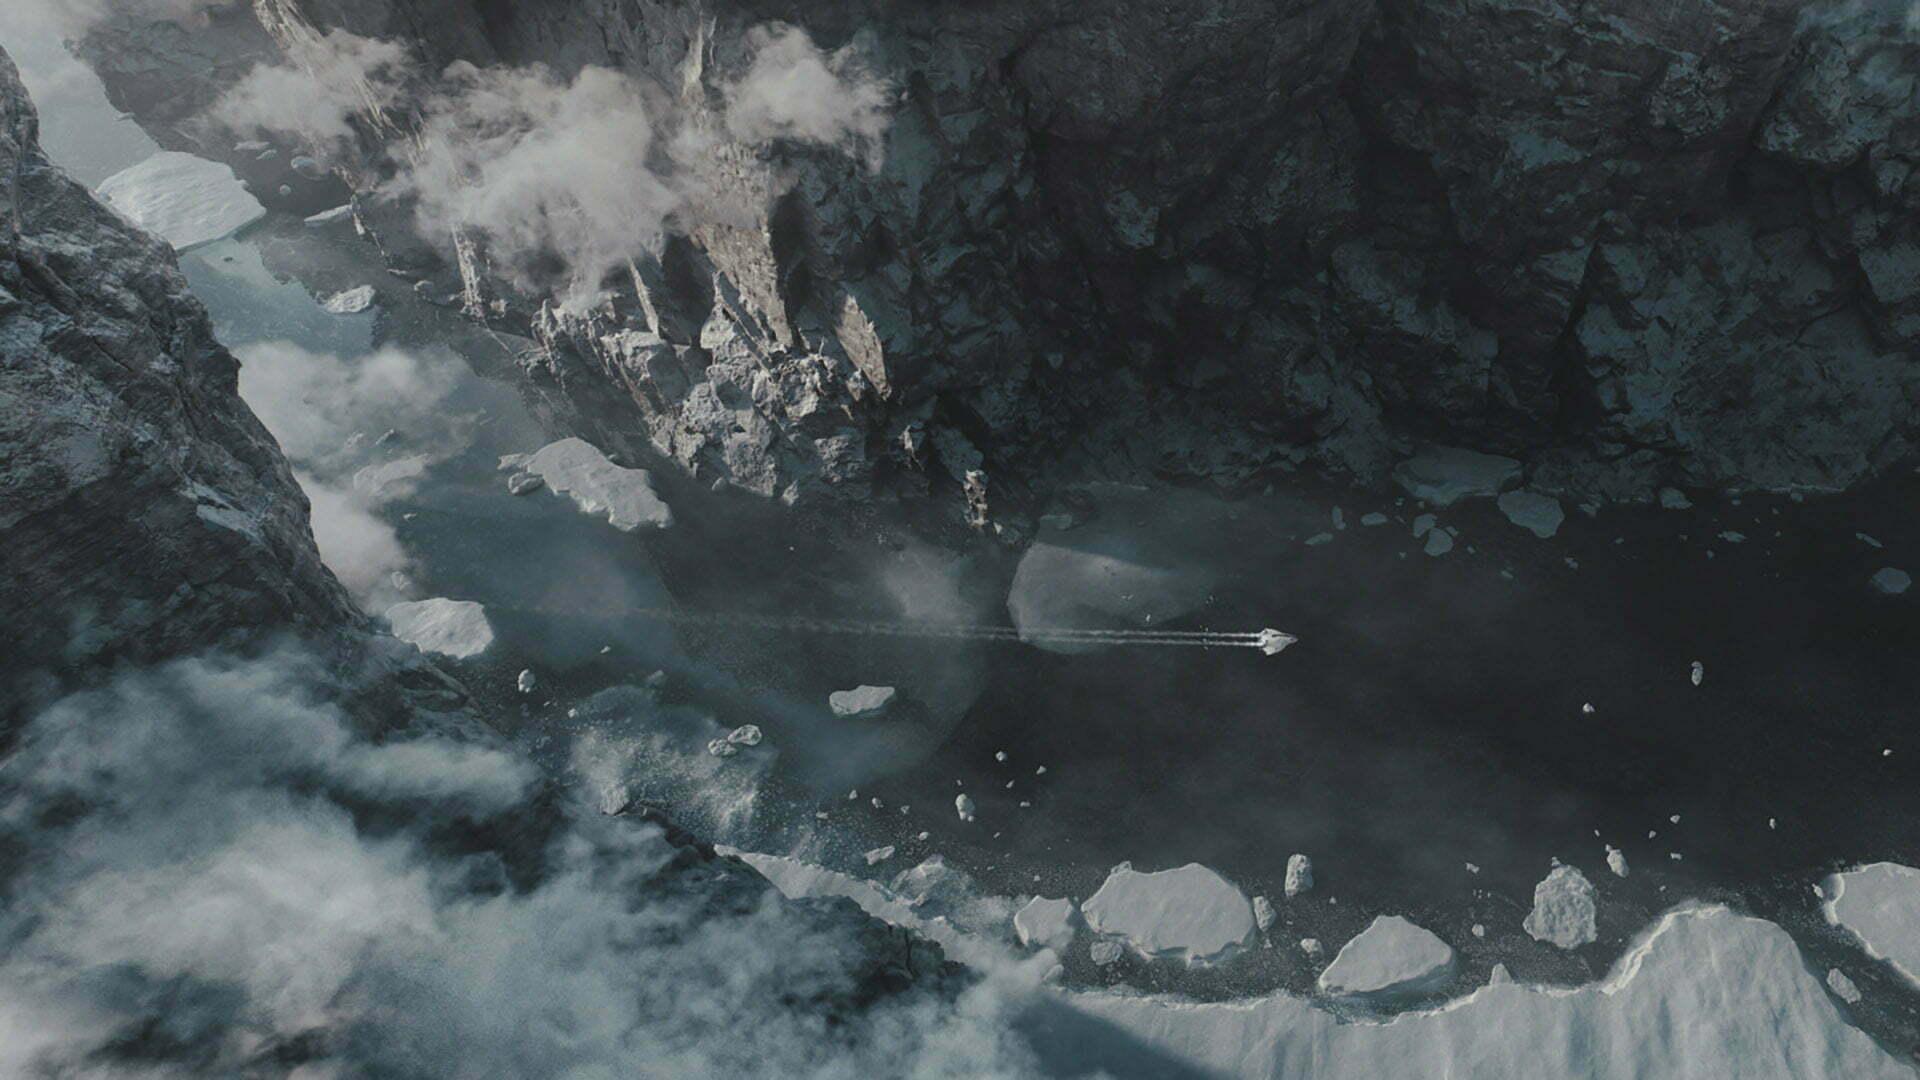 3D Mountain Environment Illustration